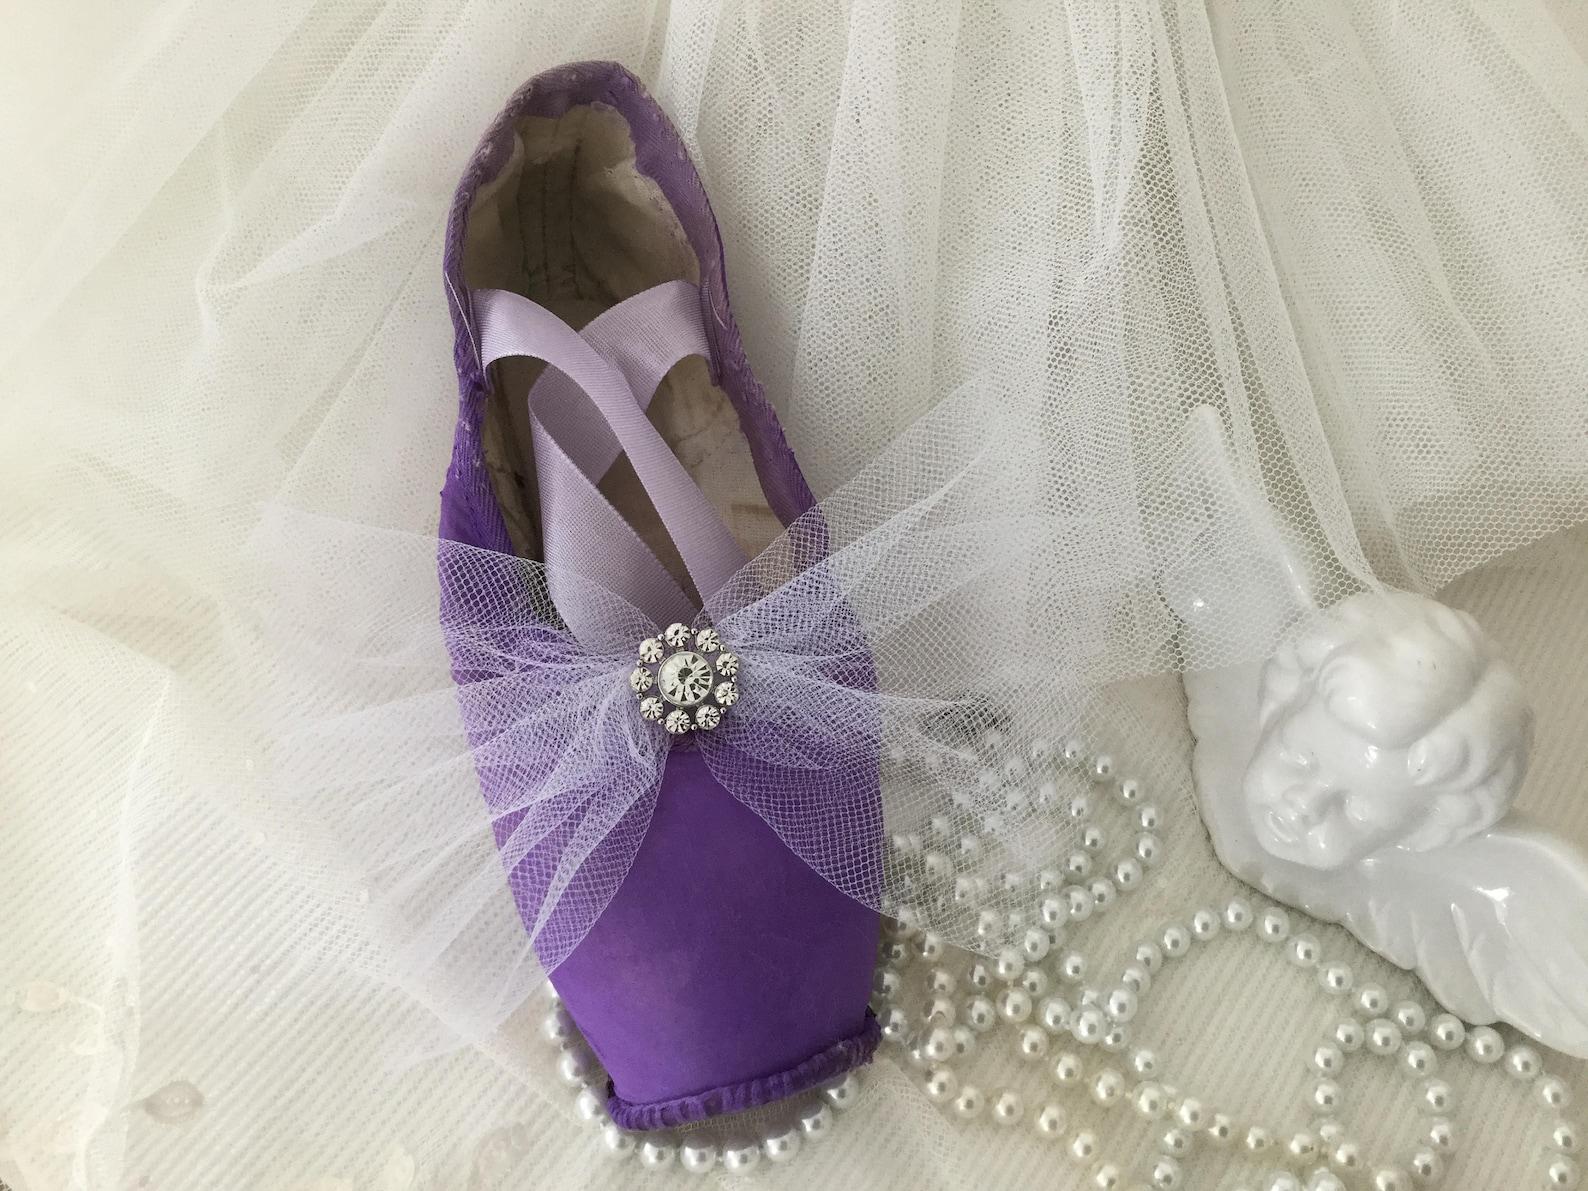 vintage ballet shoe lace shoe brocante rhinestones tulle edwardian style viktorian style coeursdecaschel